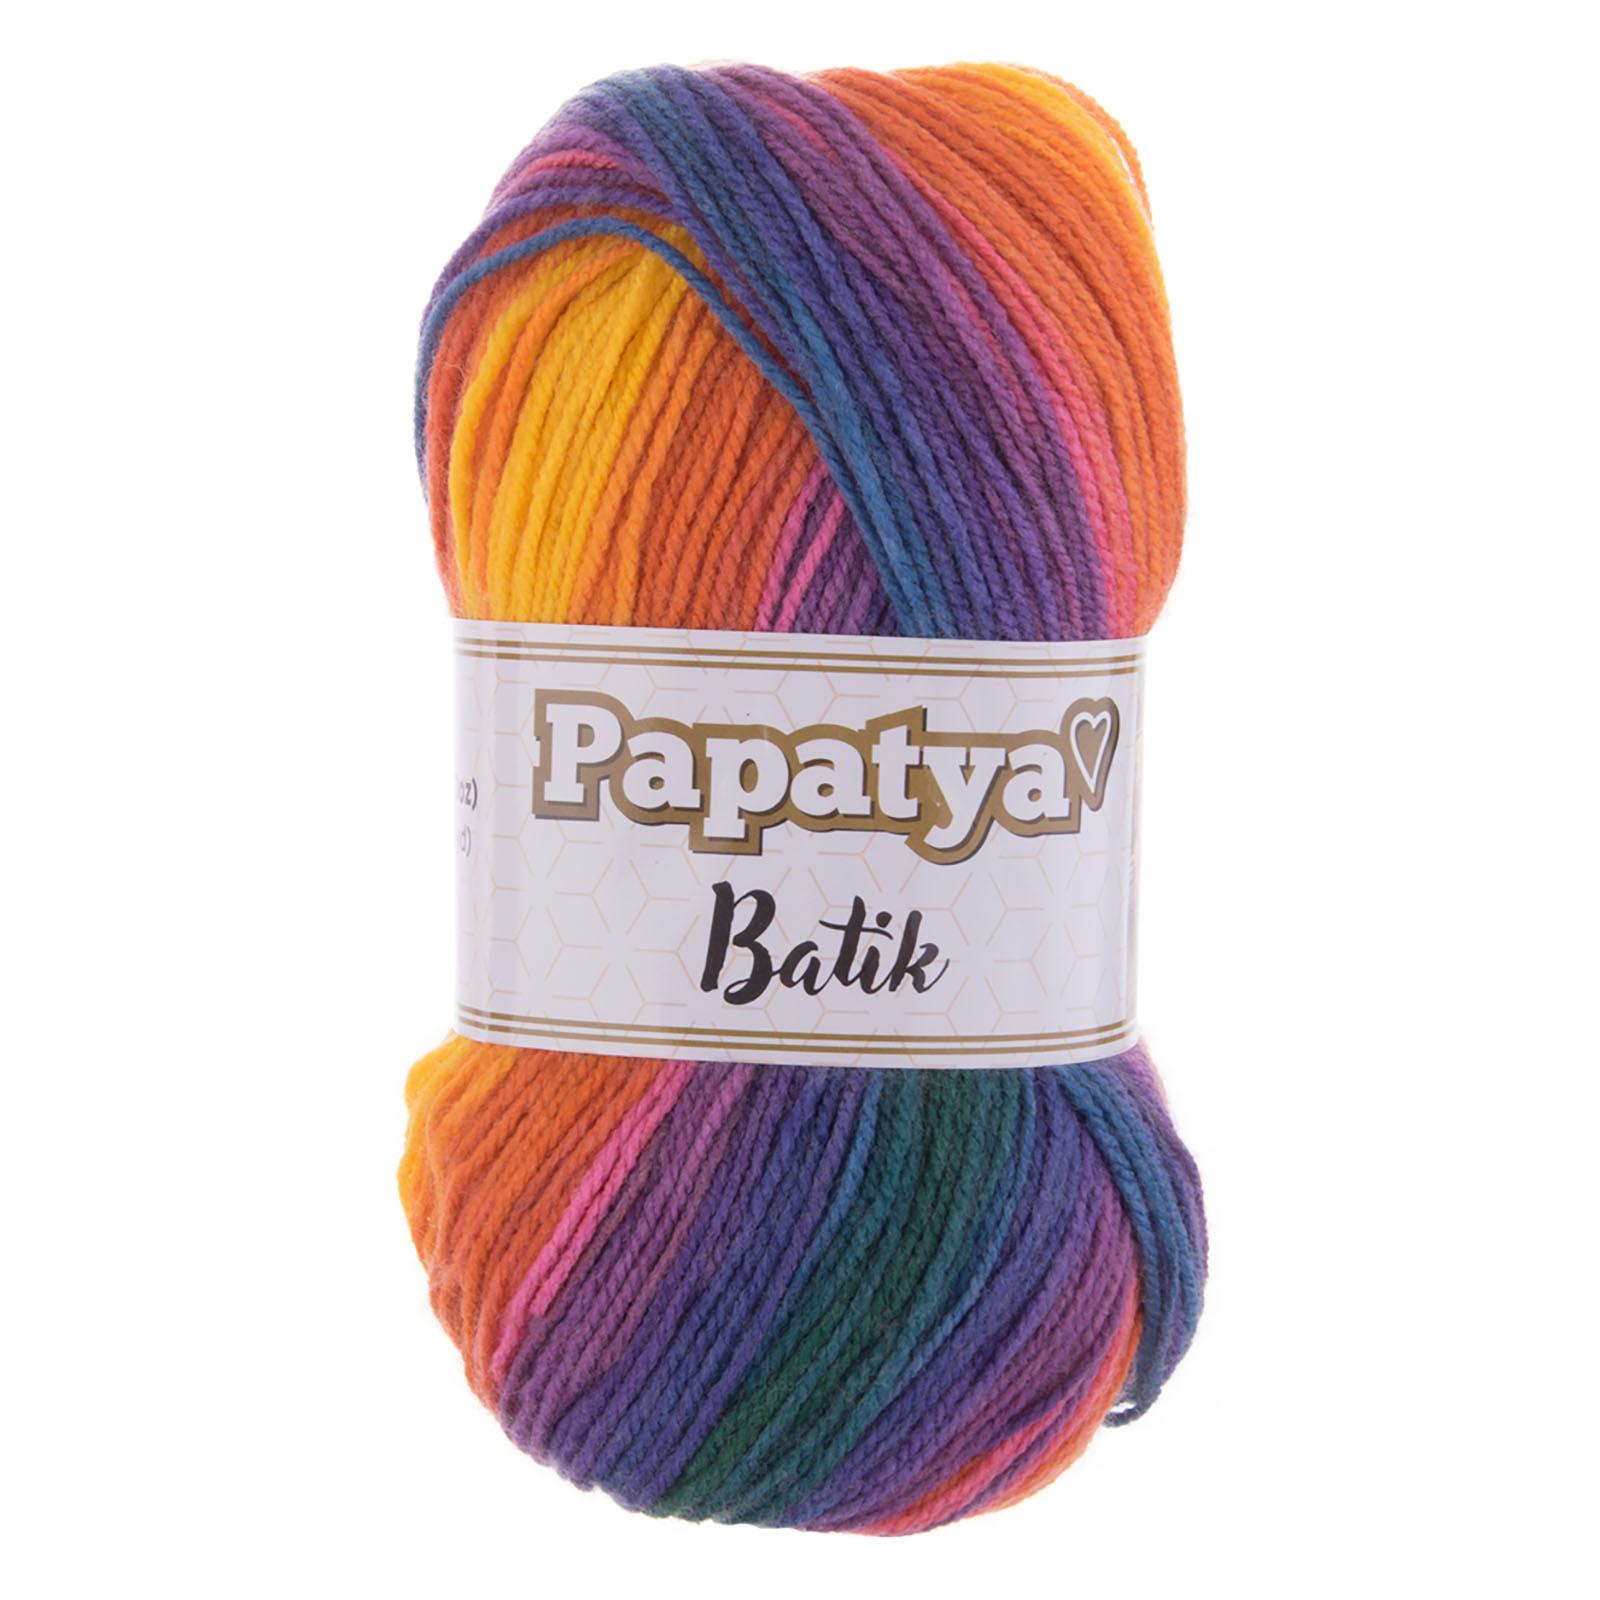 500g Farbverlaufsgarn Papatya Batik Strick-Wolle Strickgarn Häkelgarn Farbwahl – Bild 6